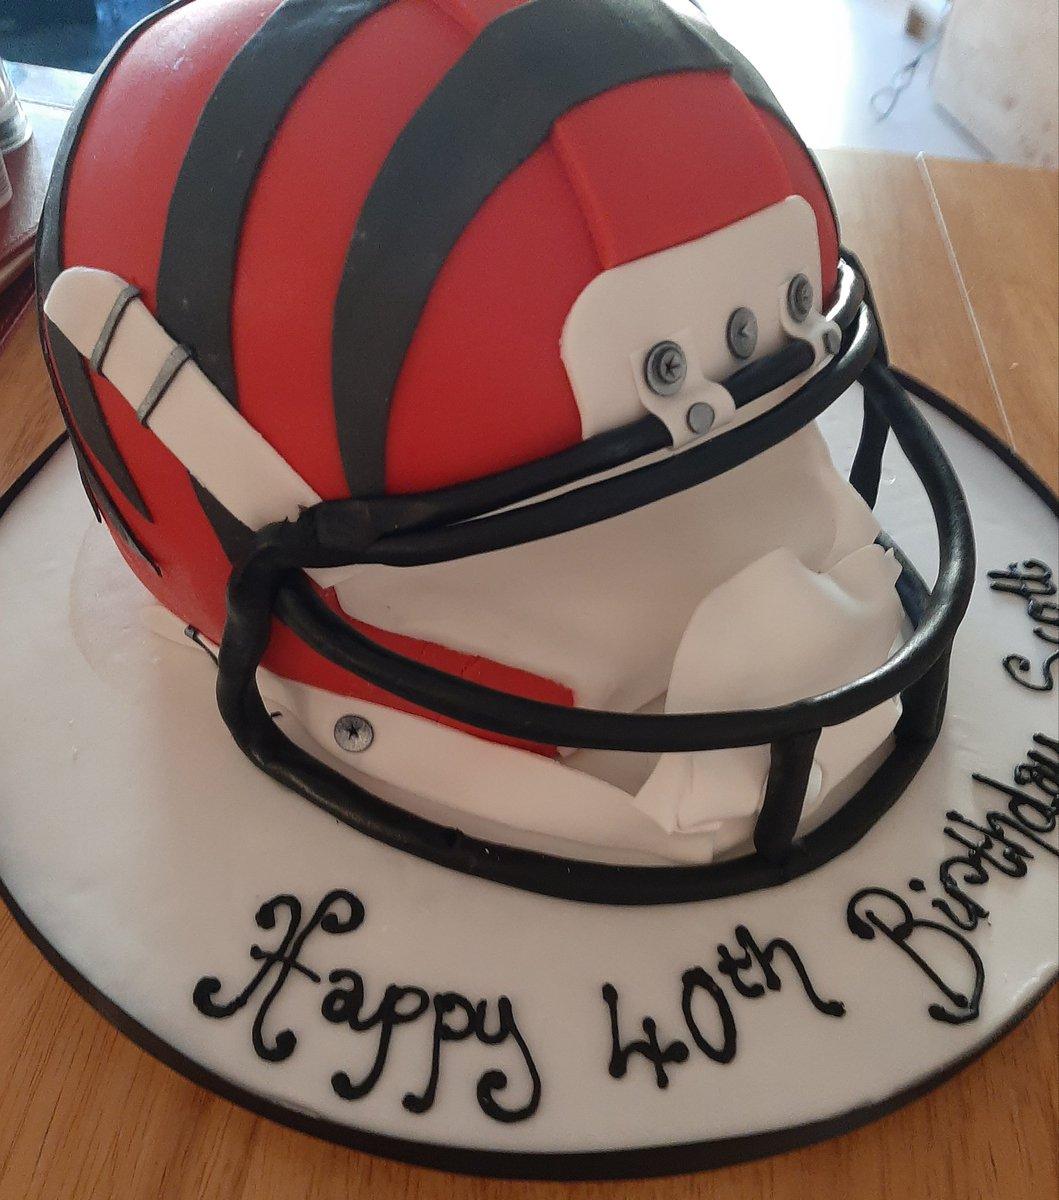 Stupendous Scottgibb On Twitter Got Given This Very Nice Birthday Cake Funny Birthday Cards Online Necthendildamsfinfo